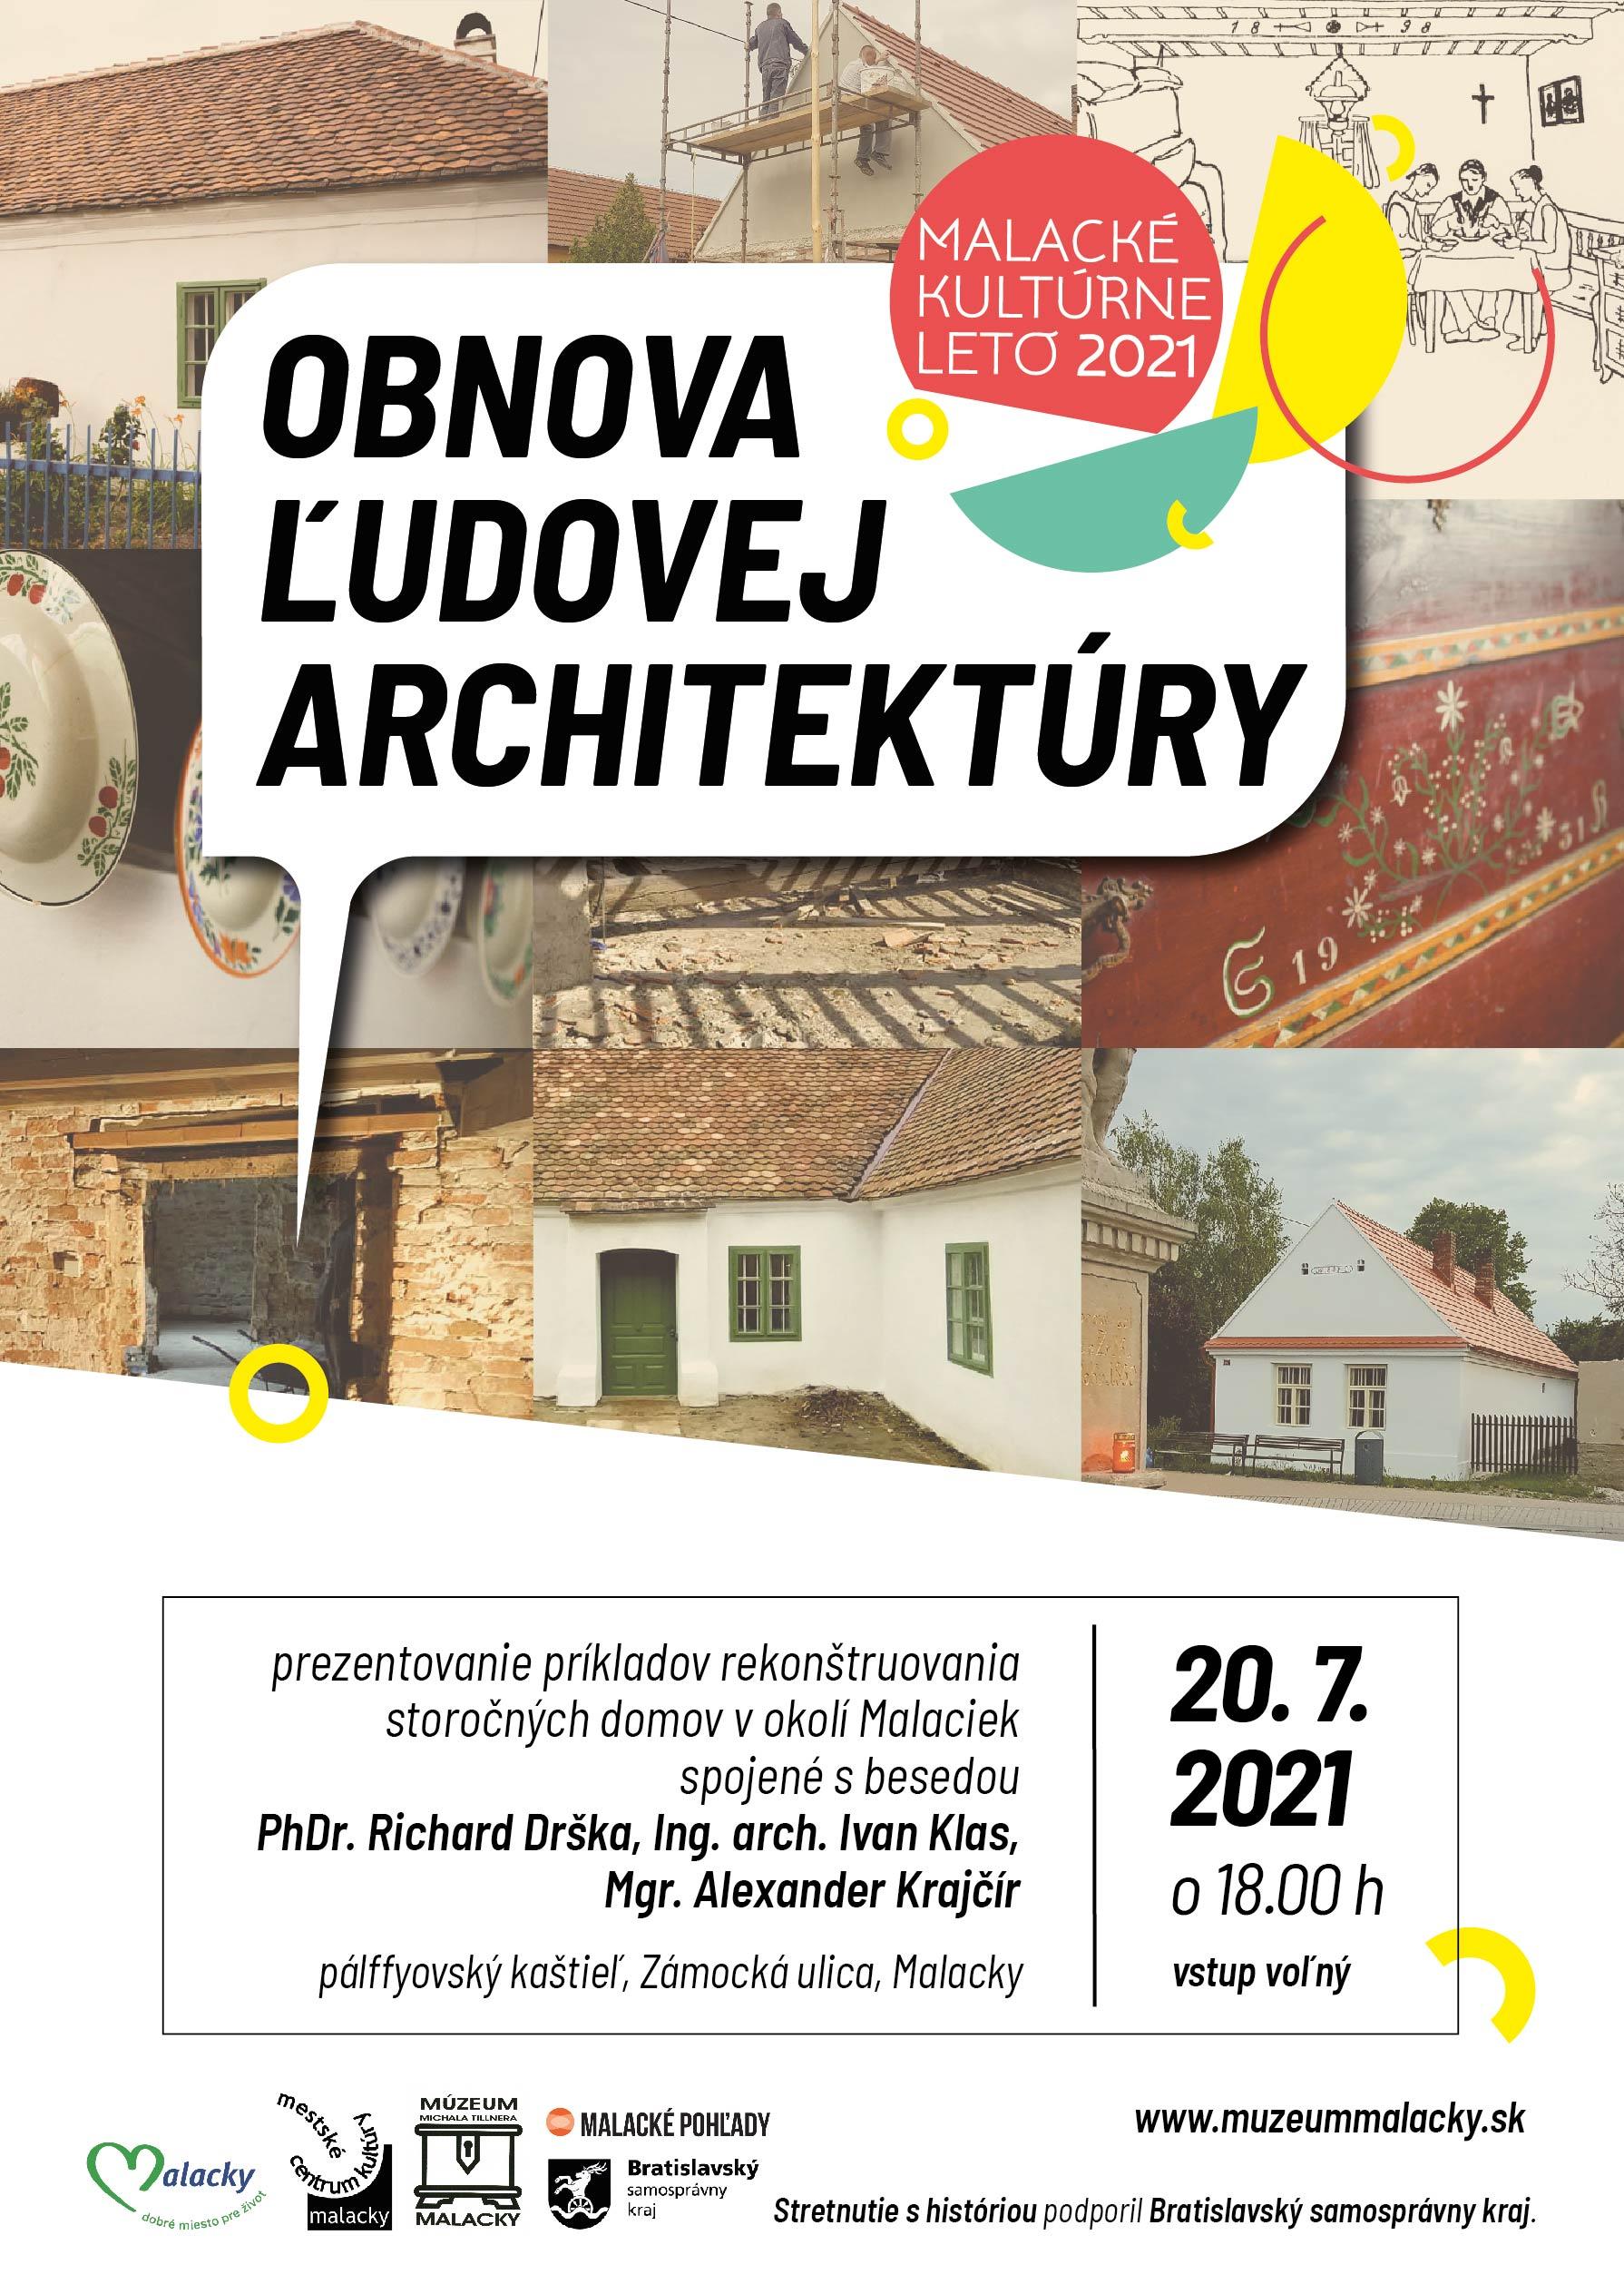 mkl_2021_obnova_lud_arch_Kreslic pltno 11jpg